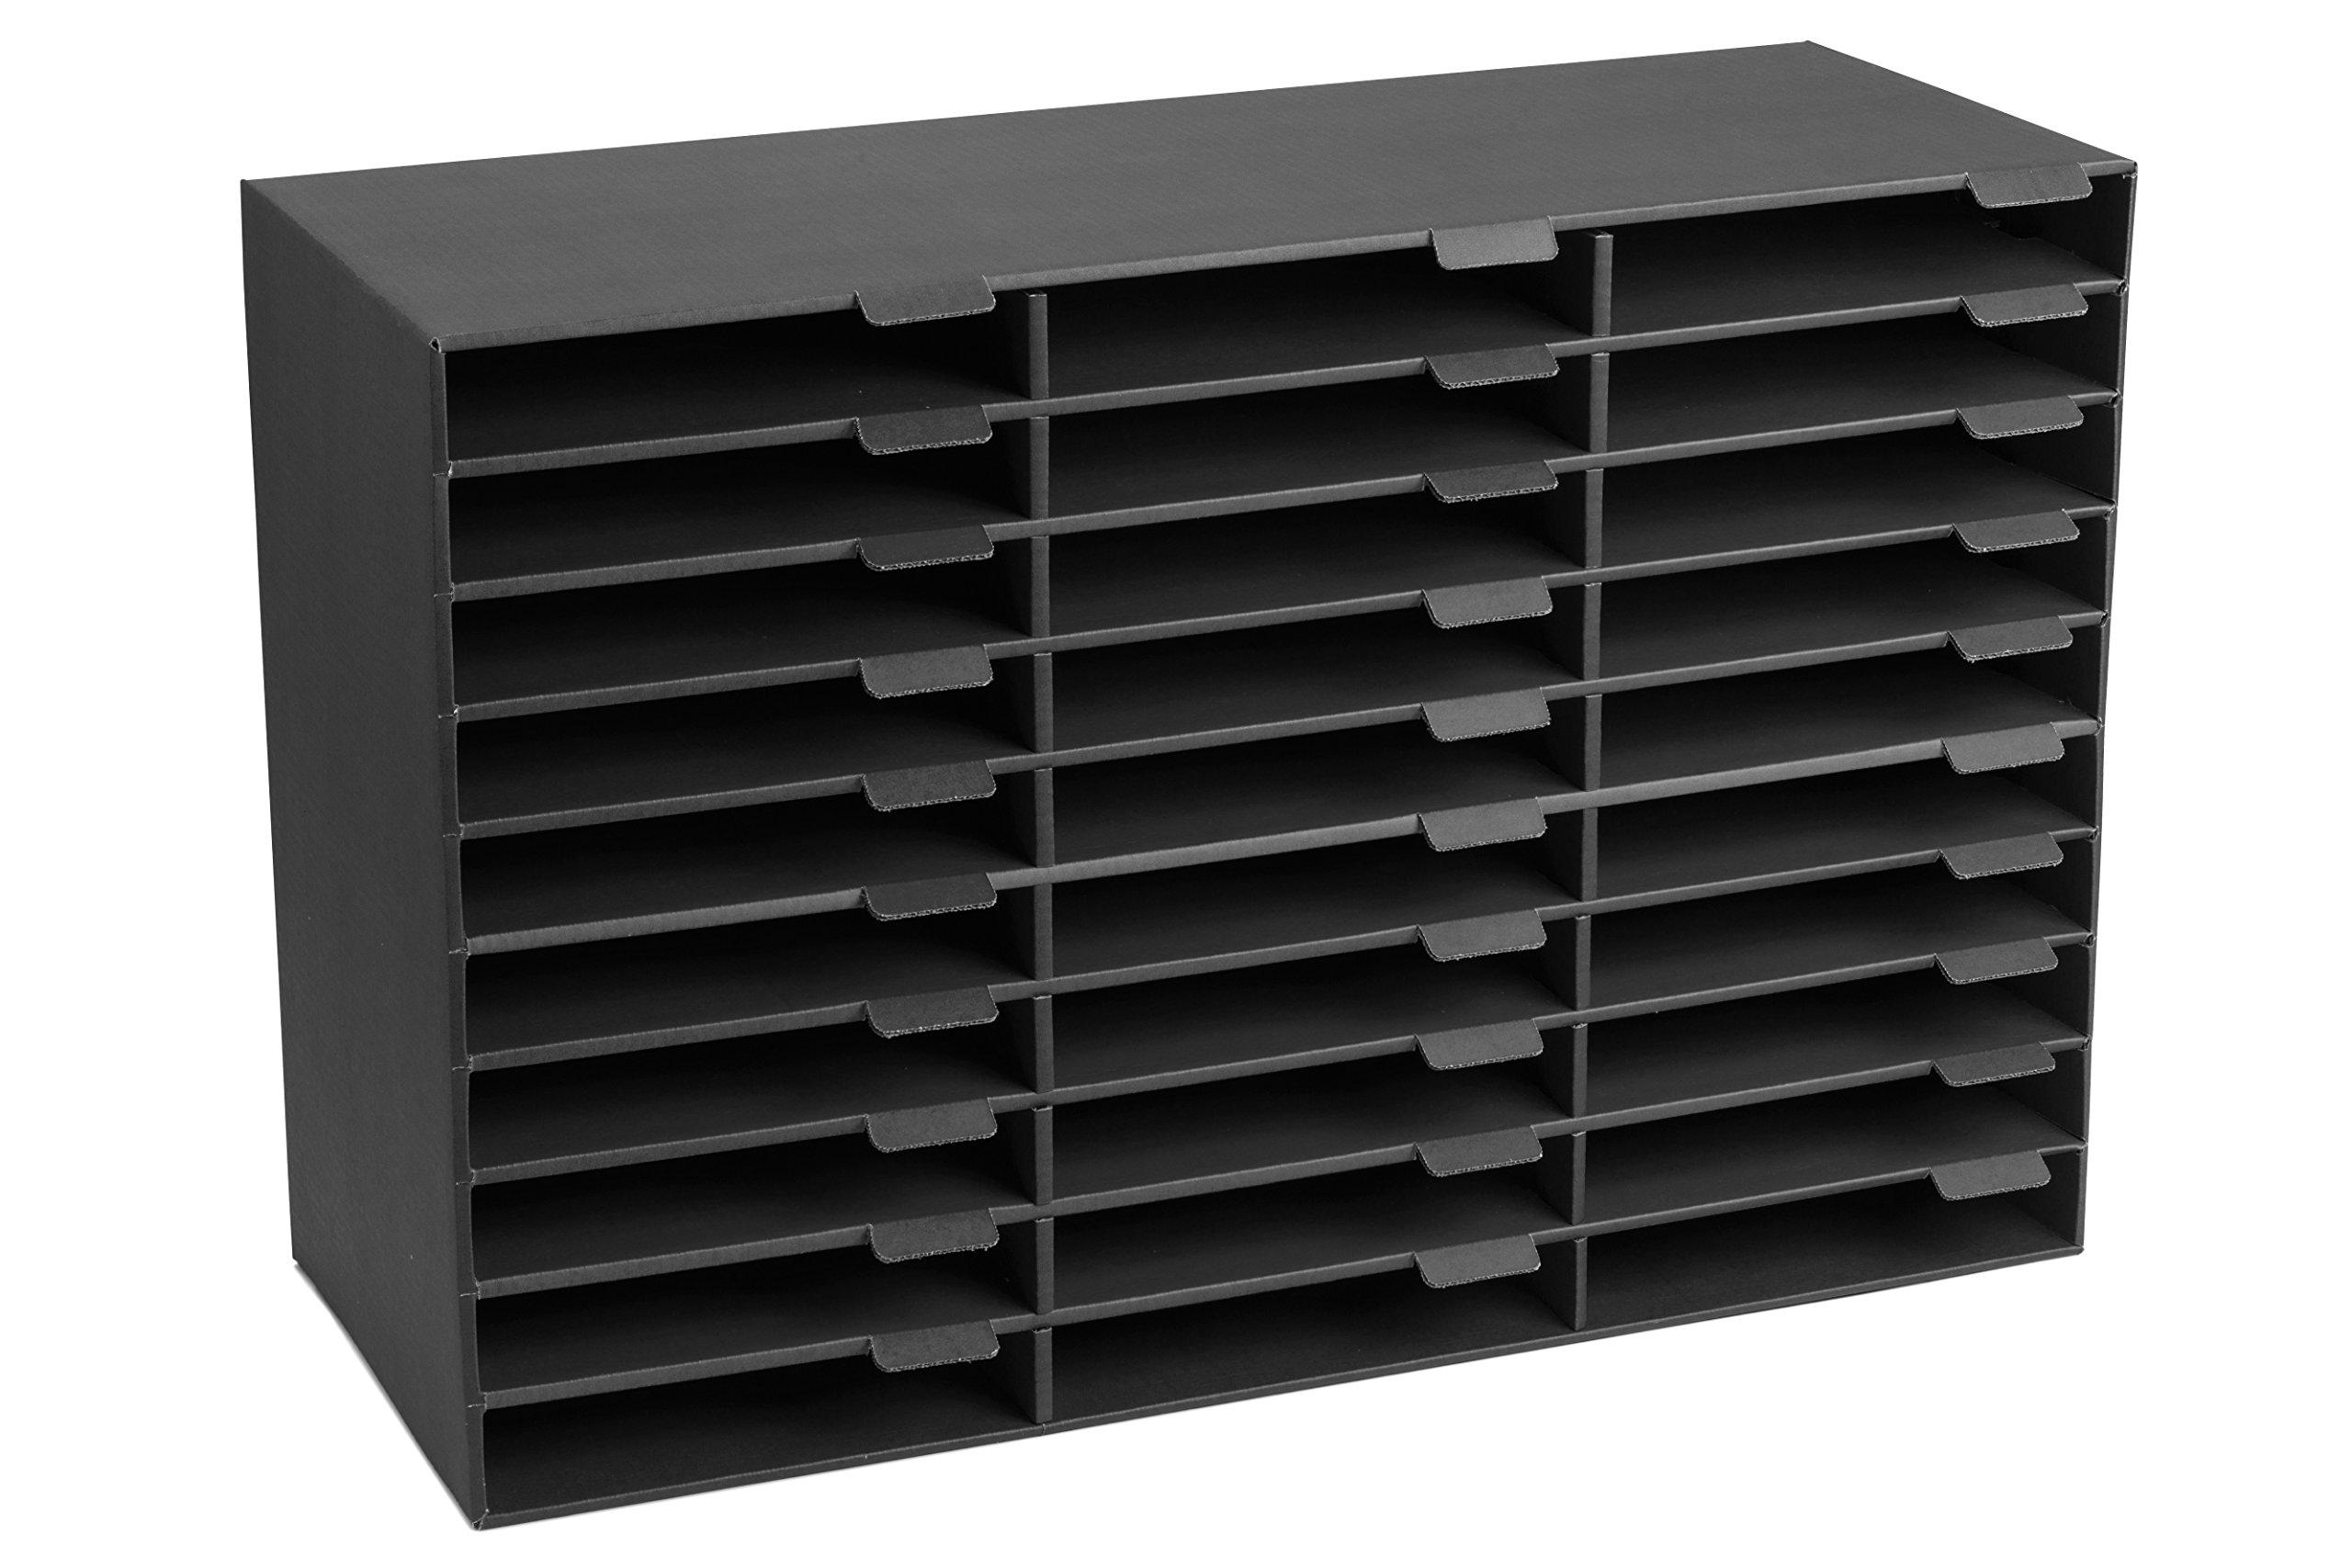 AdirOffice File Organizer Classroom - Office - Home - Corrugated Cardboard (30 Slots, Black) by AdirOffice